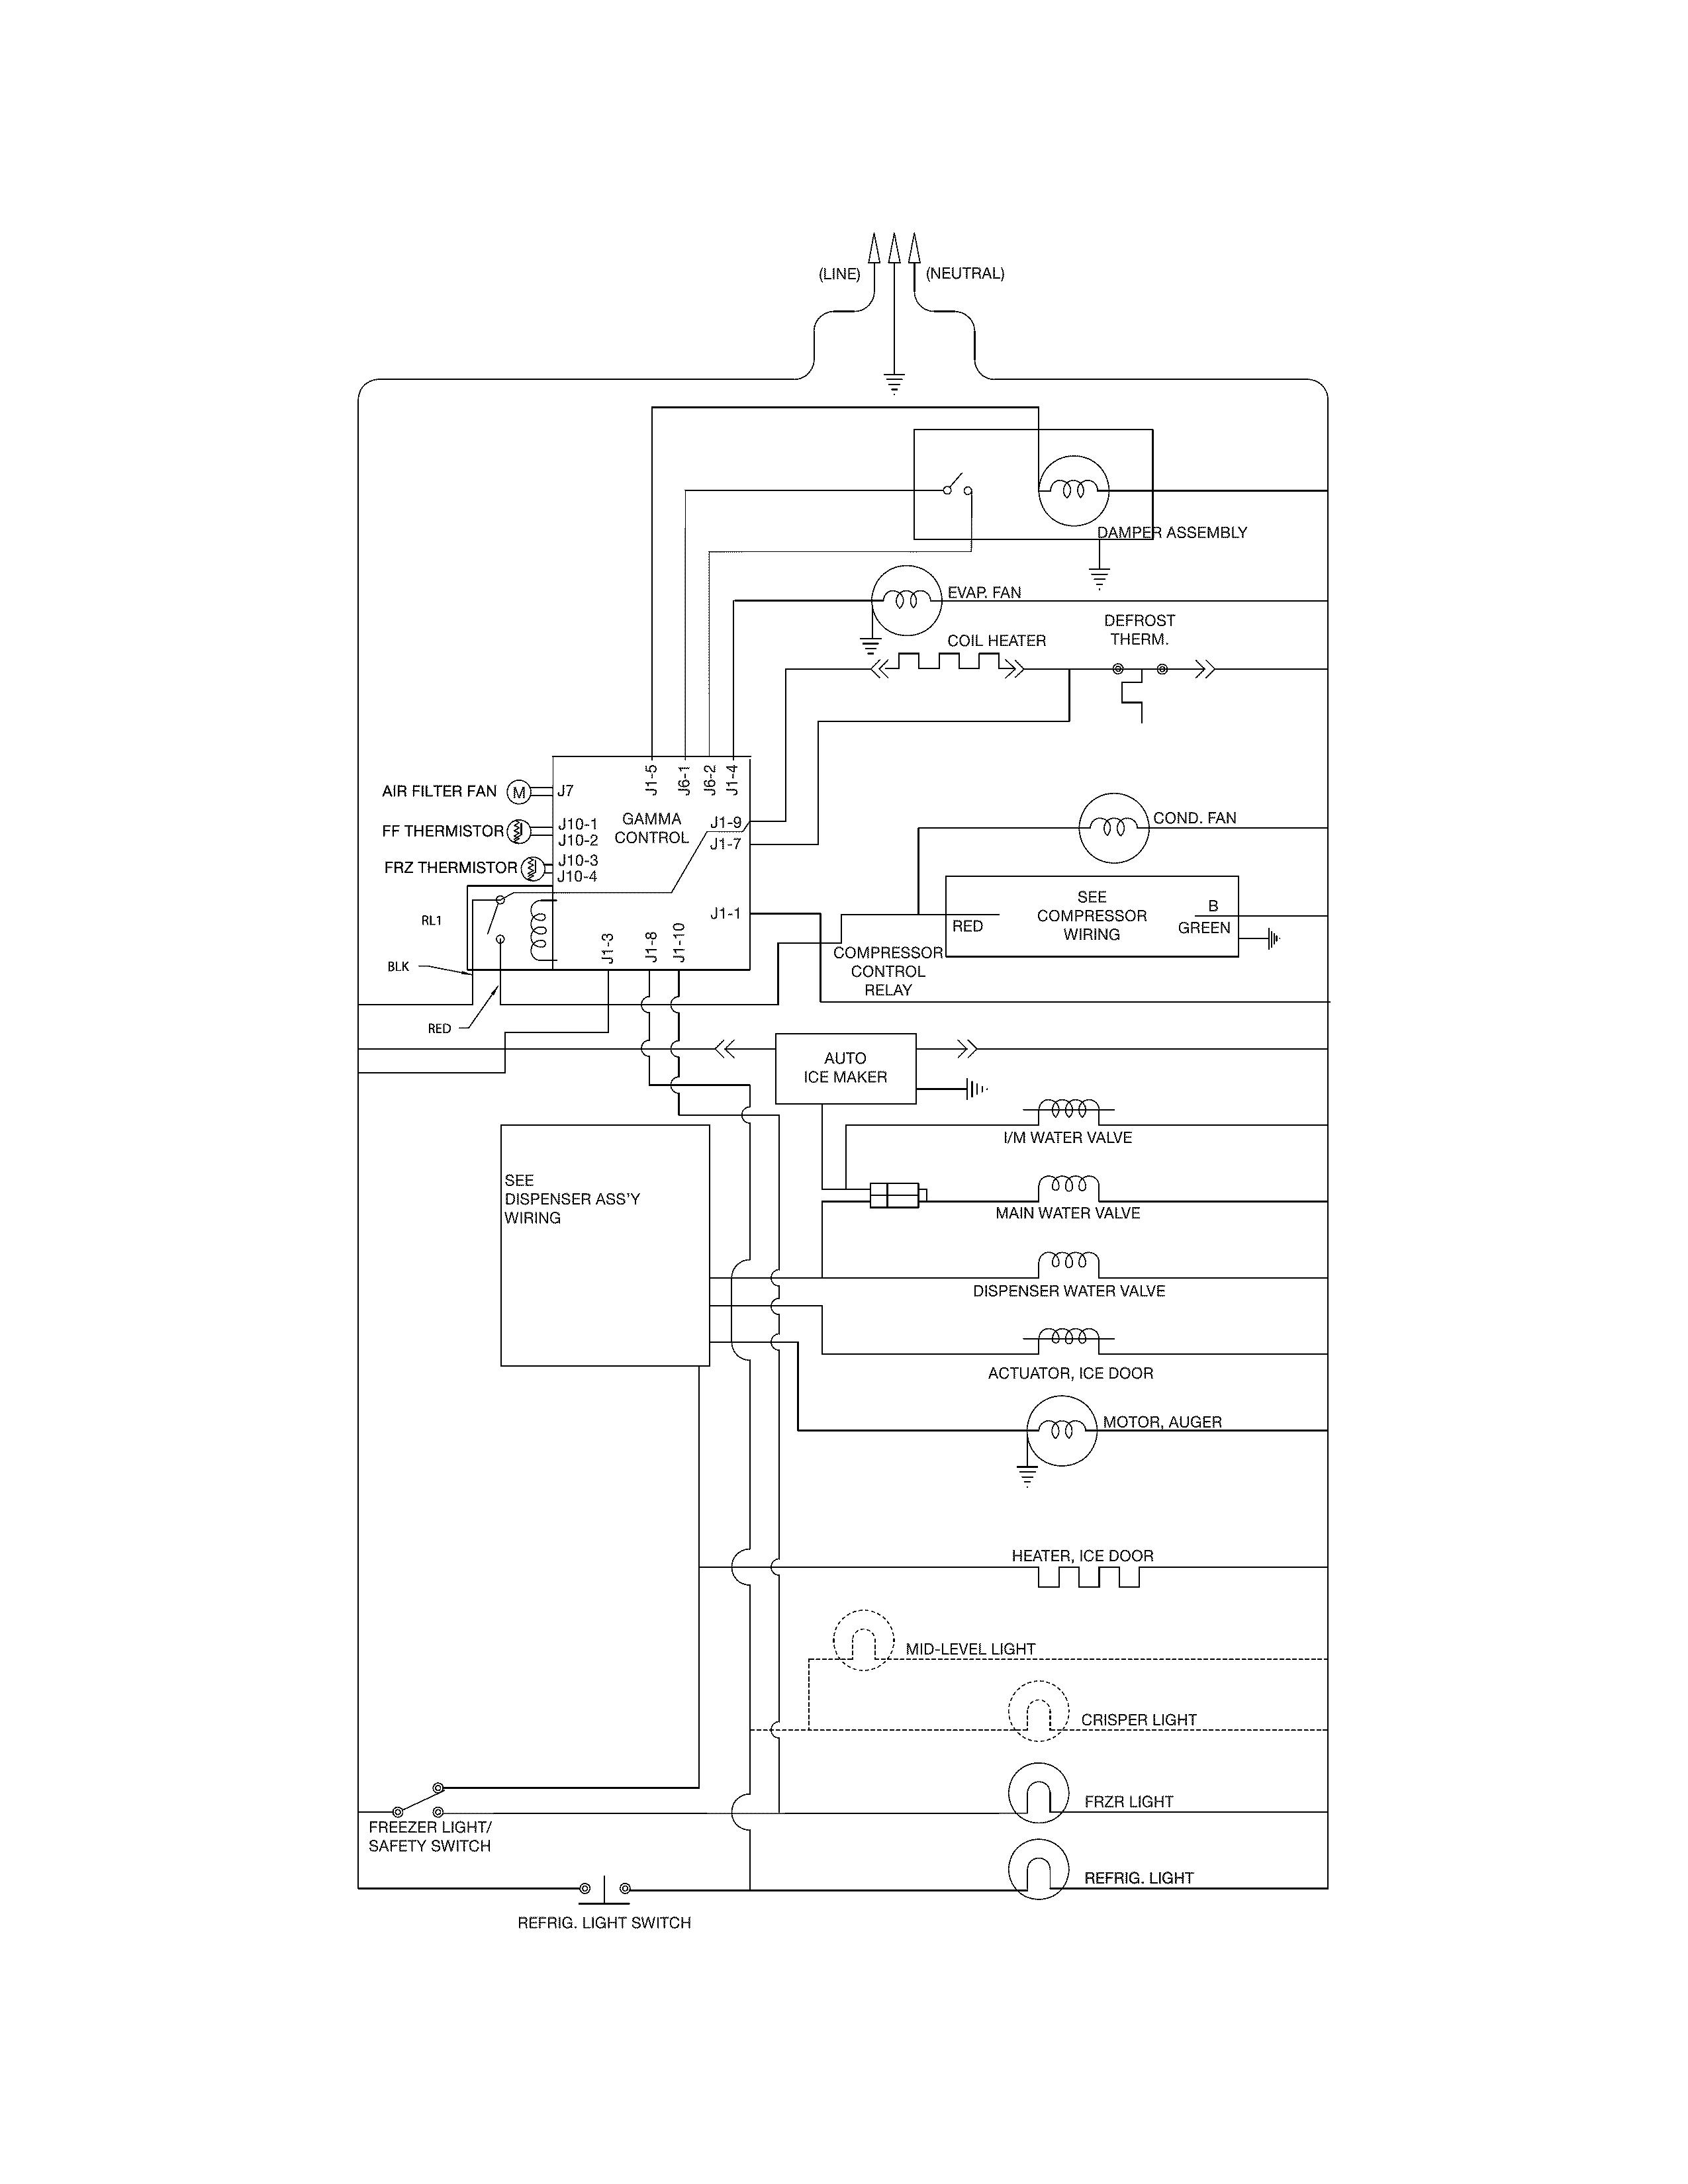 Swell Frigidaire Wiring Diagram Refrigerator Wiring Diagram B7 Wiring Cloud Timewinrebemohammedshrineorg